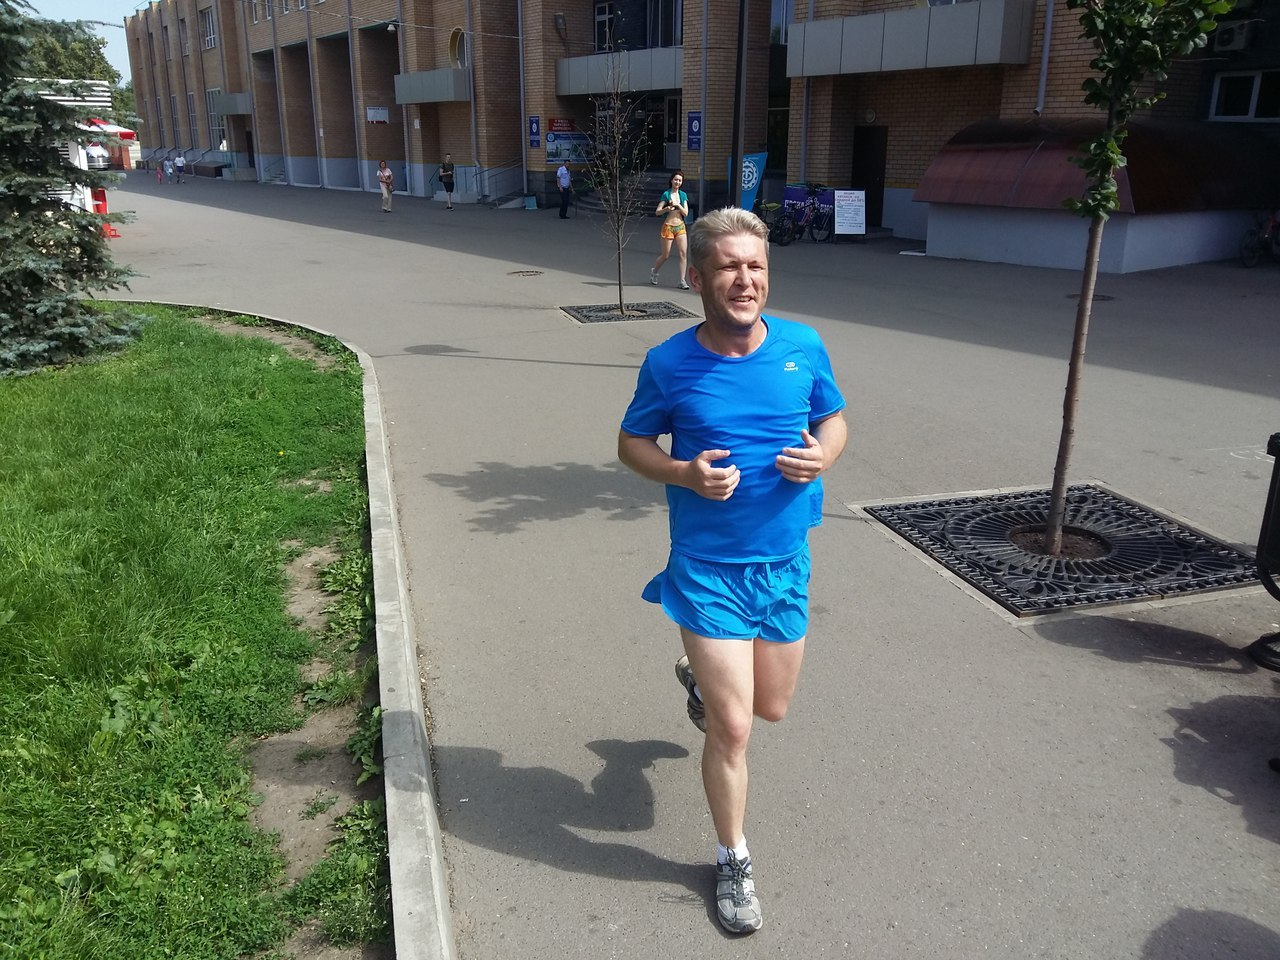 Бежит Самат Васильев